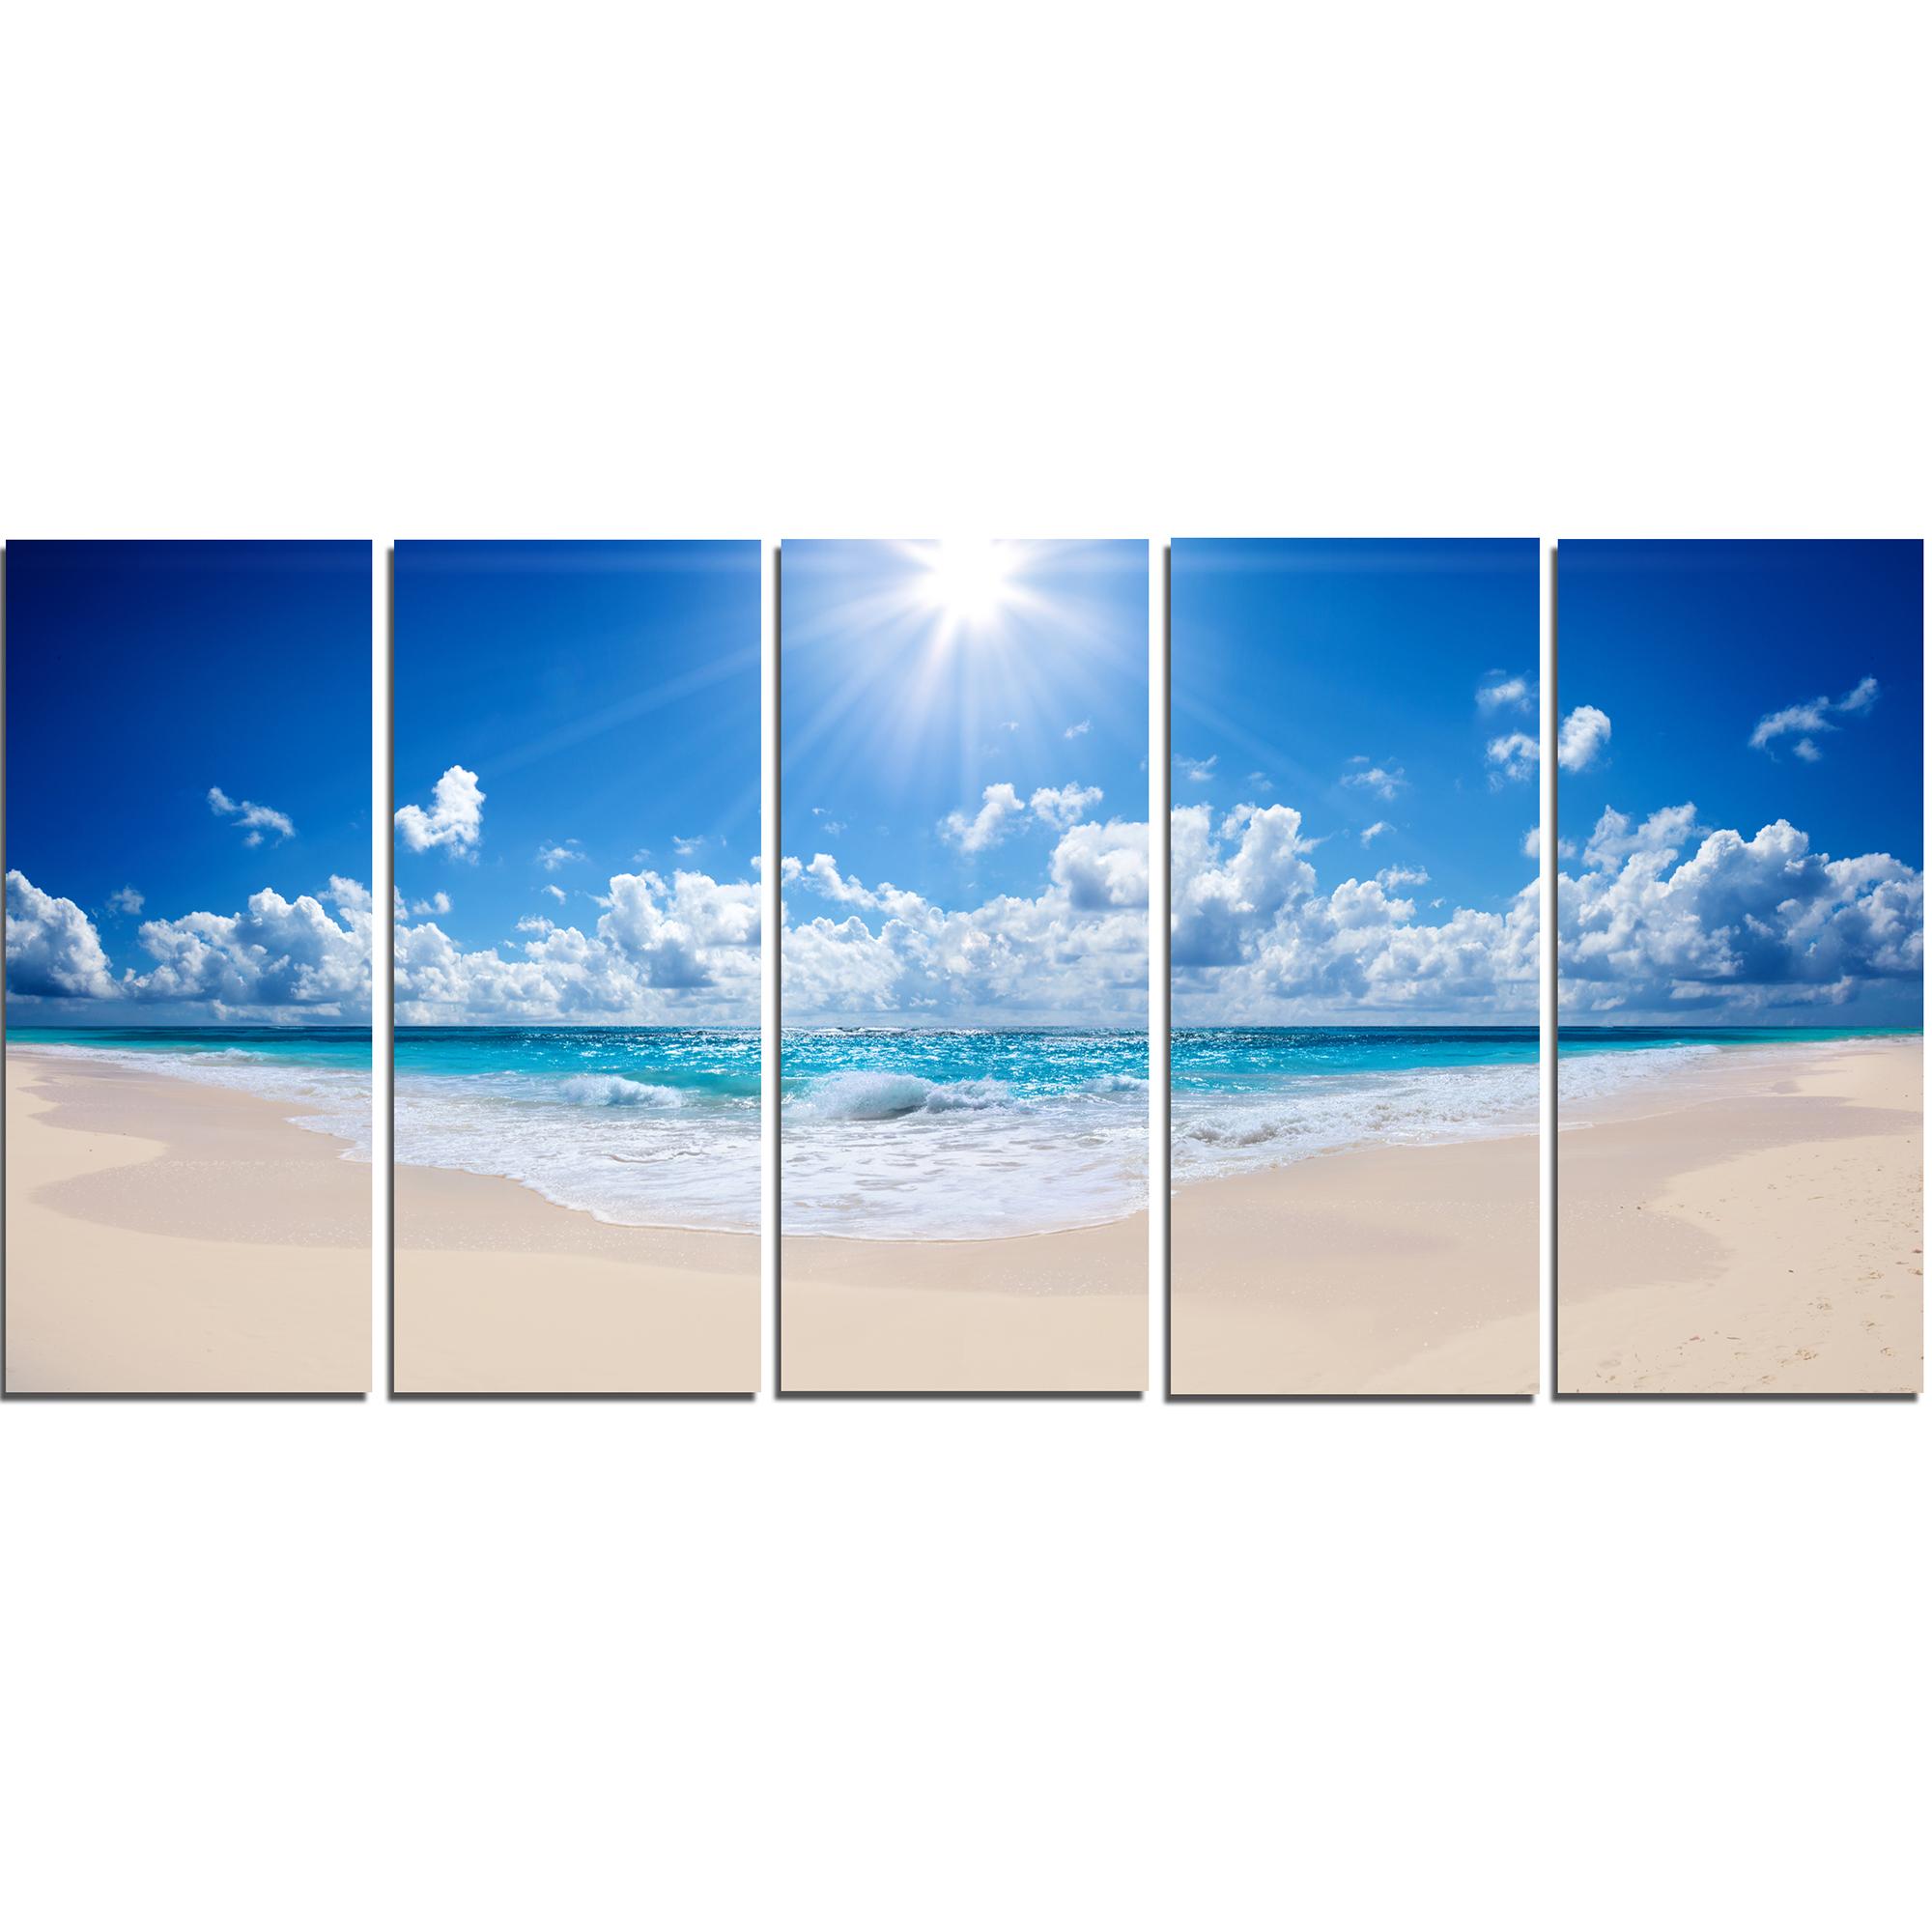 Design Art - Beautiful Tropical Beach Panorama - image 1 de 3